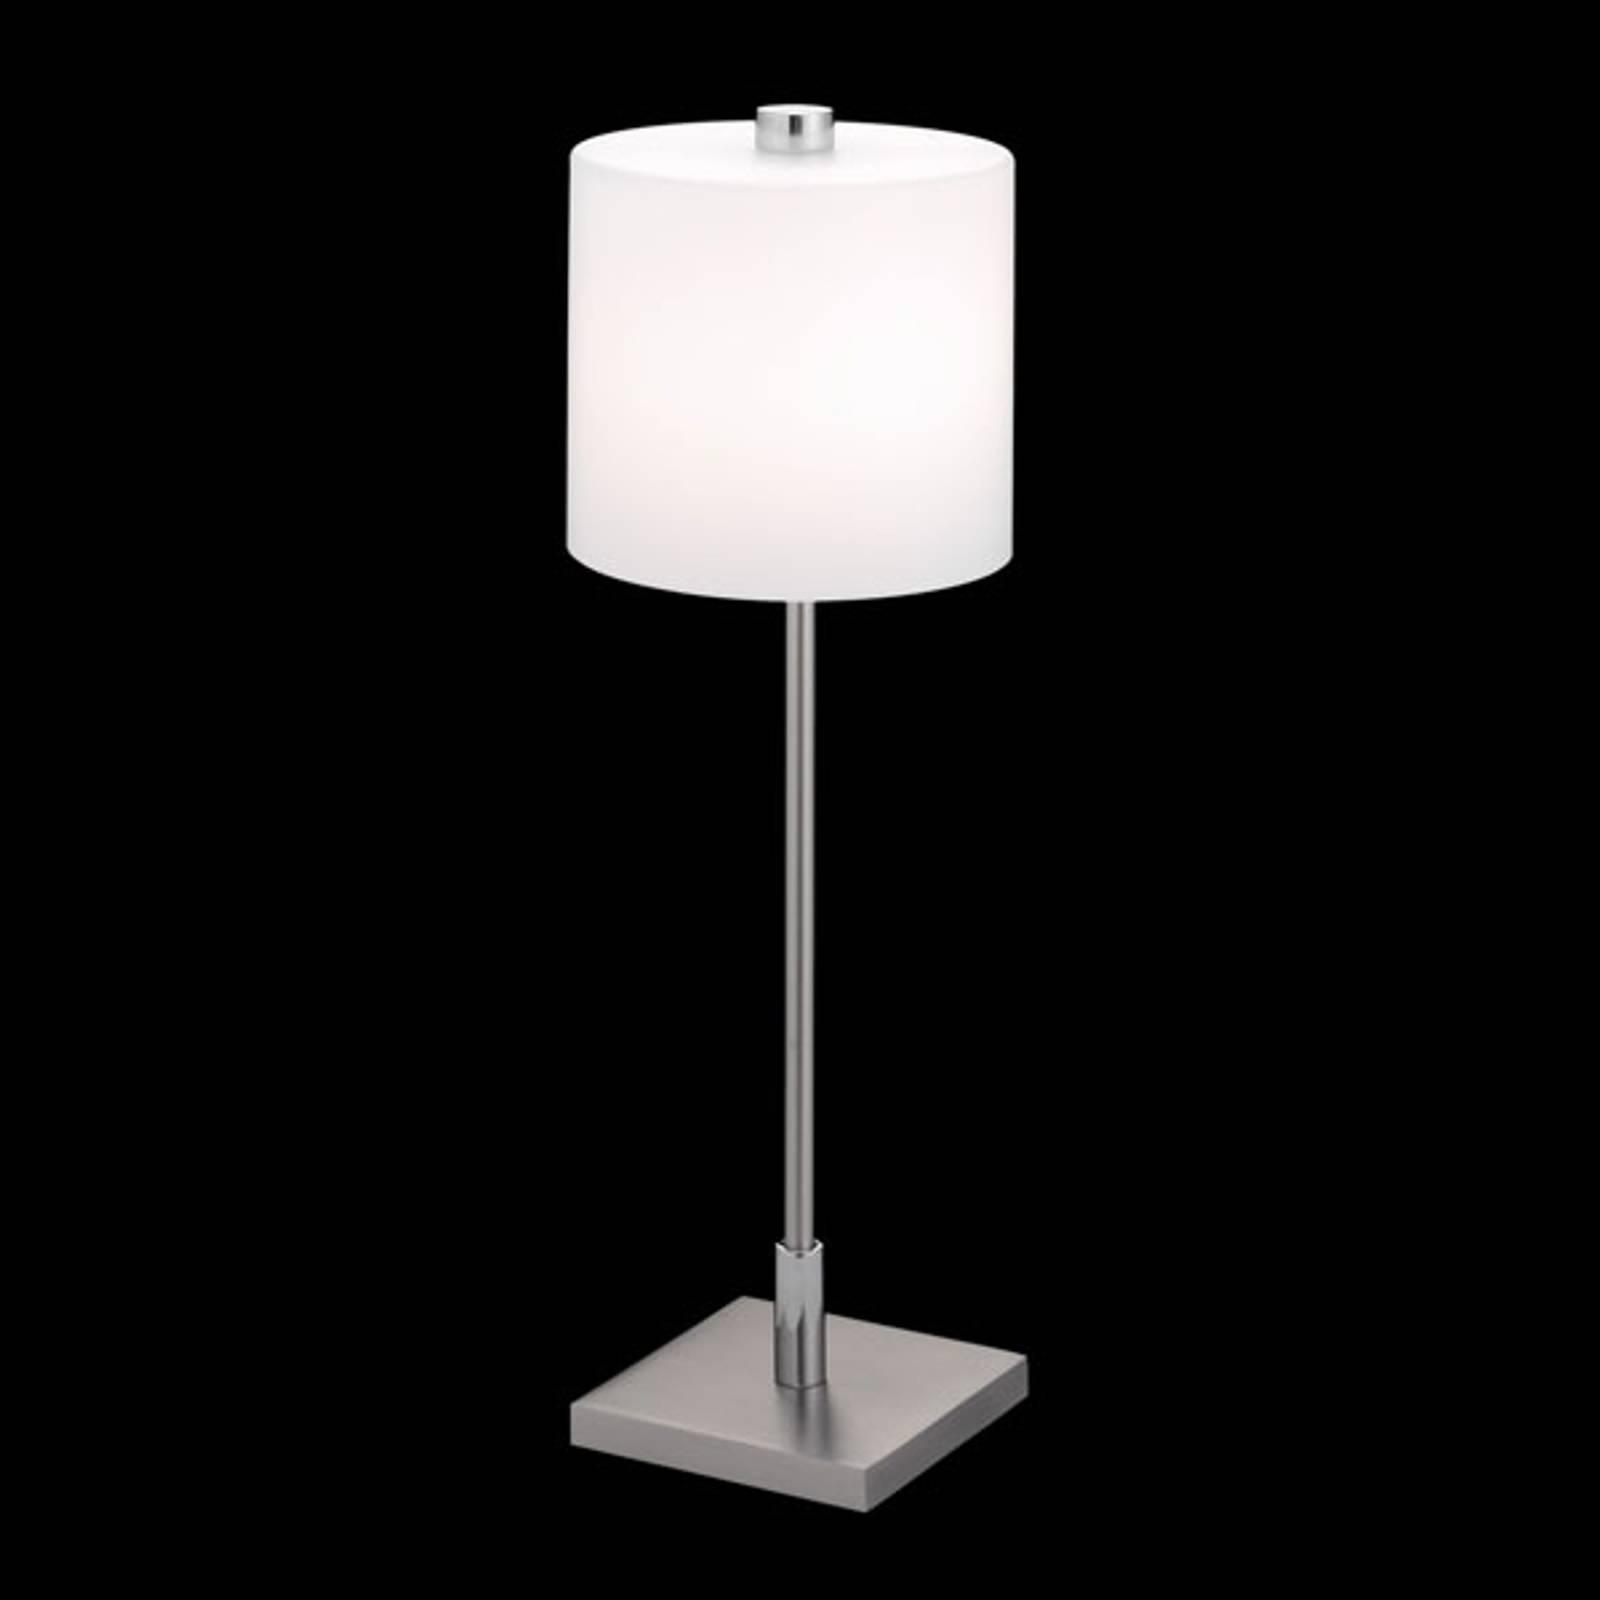 Lampe à poser KNAPSTEIN MERCY nickel mat chrome